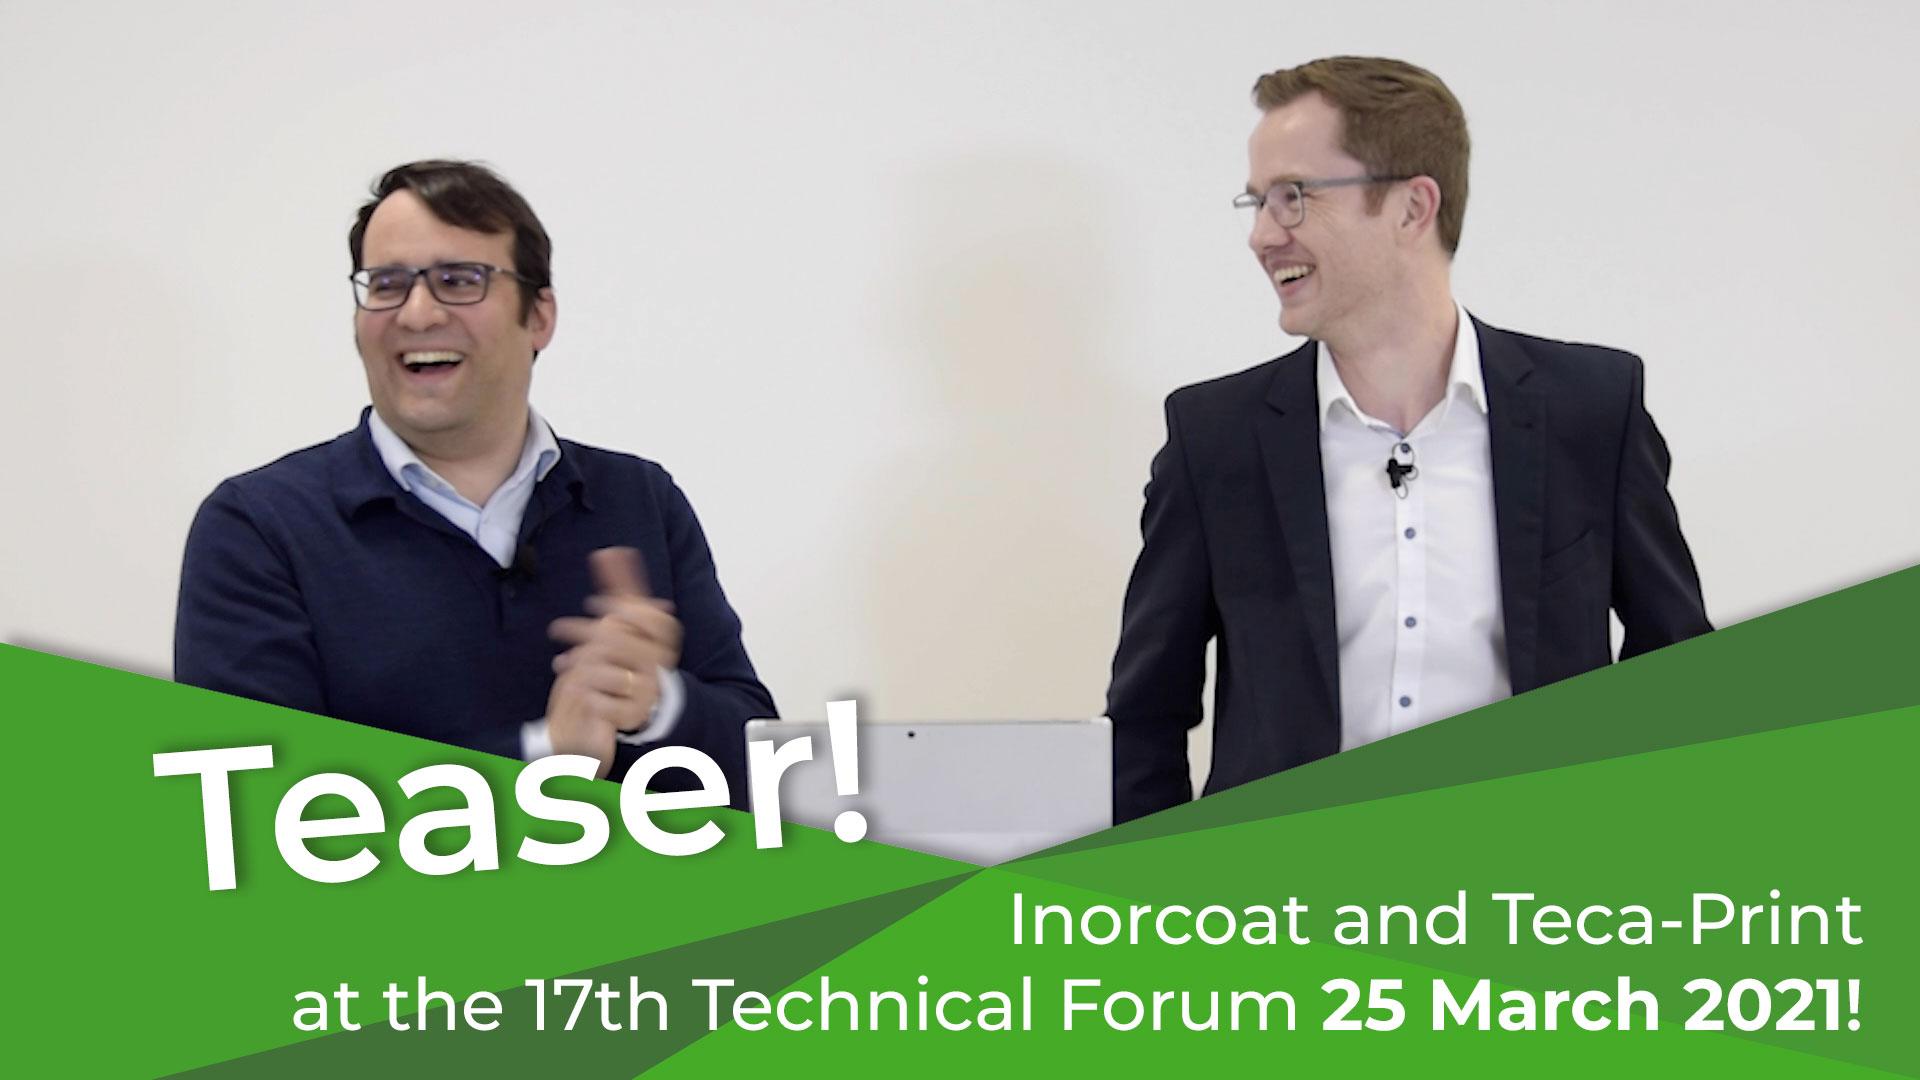 Next week, 25 March 2021 at 17th TechnicalForum at the WorldMoneyFair 2021!